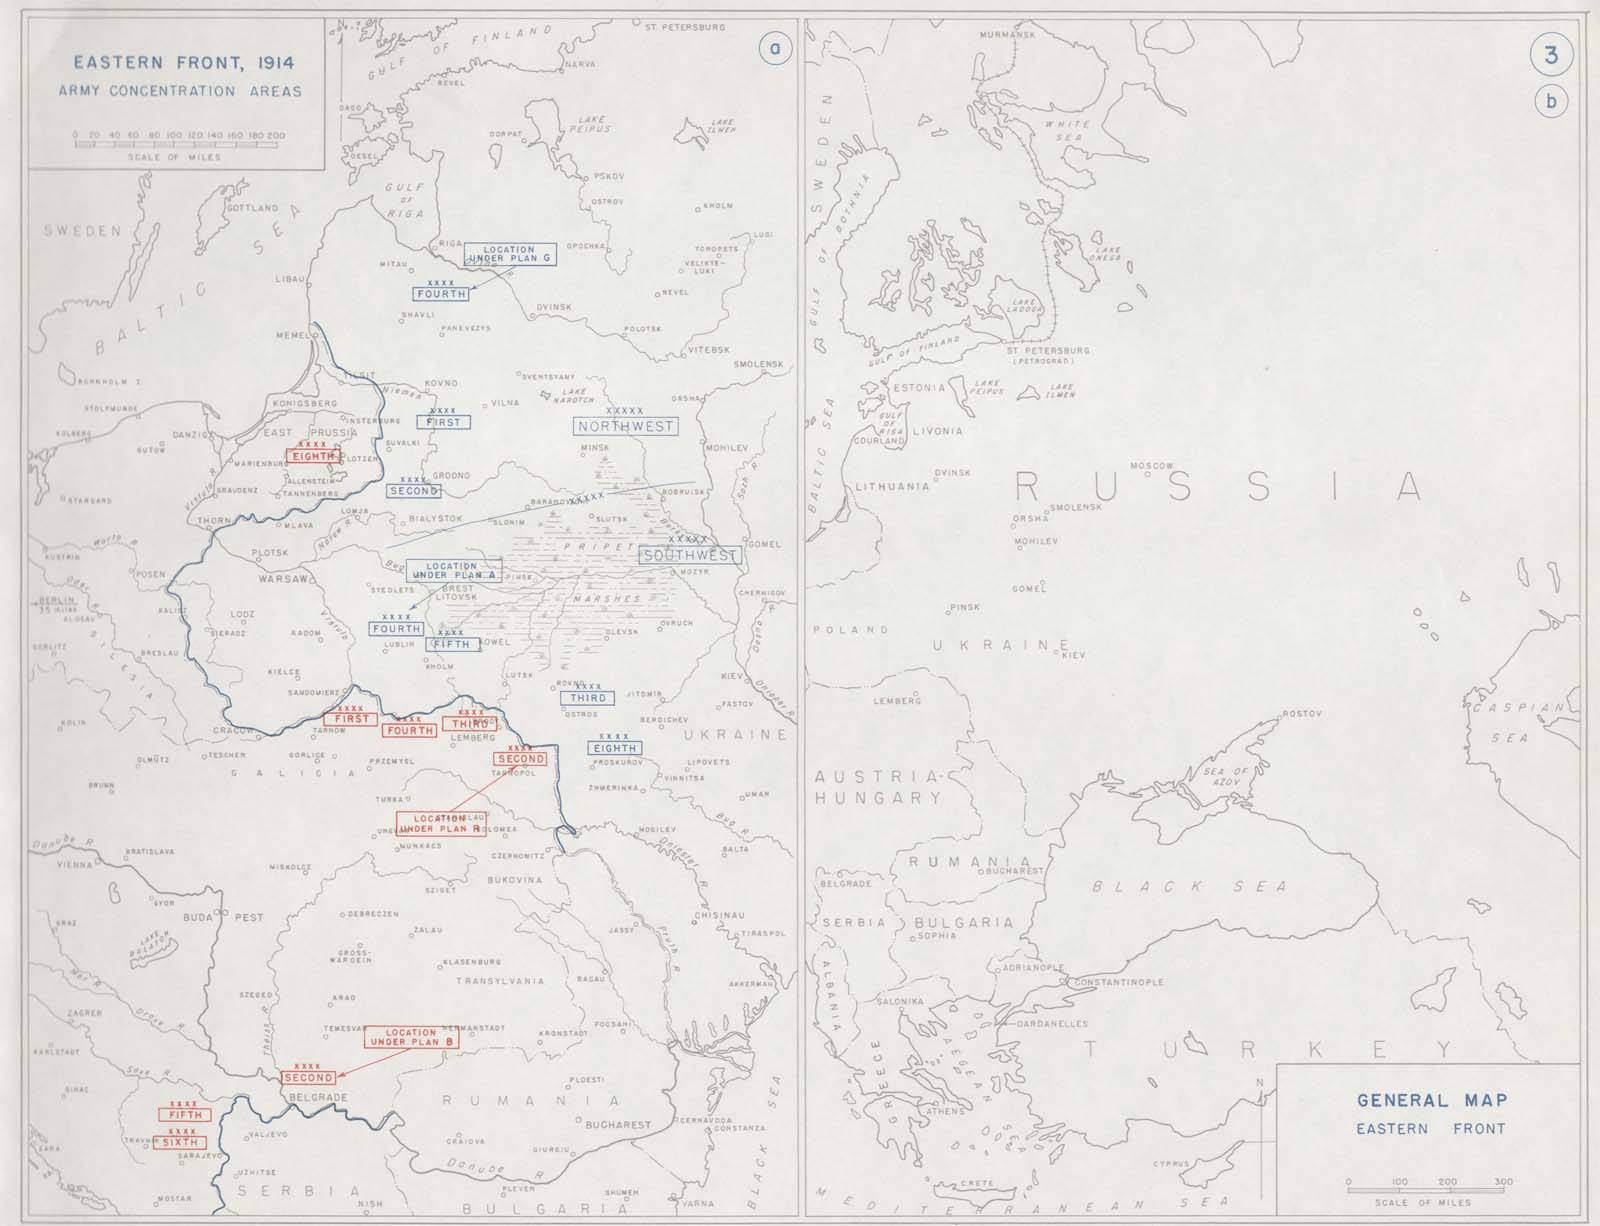 First world war - Eastern front